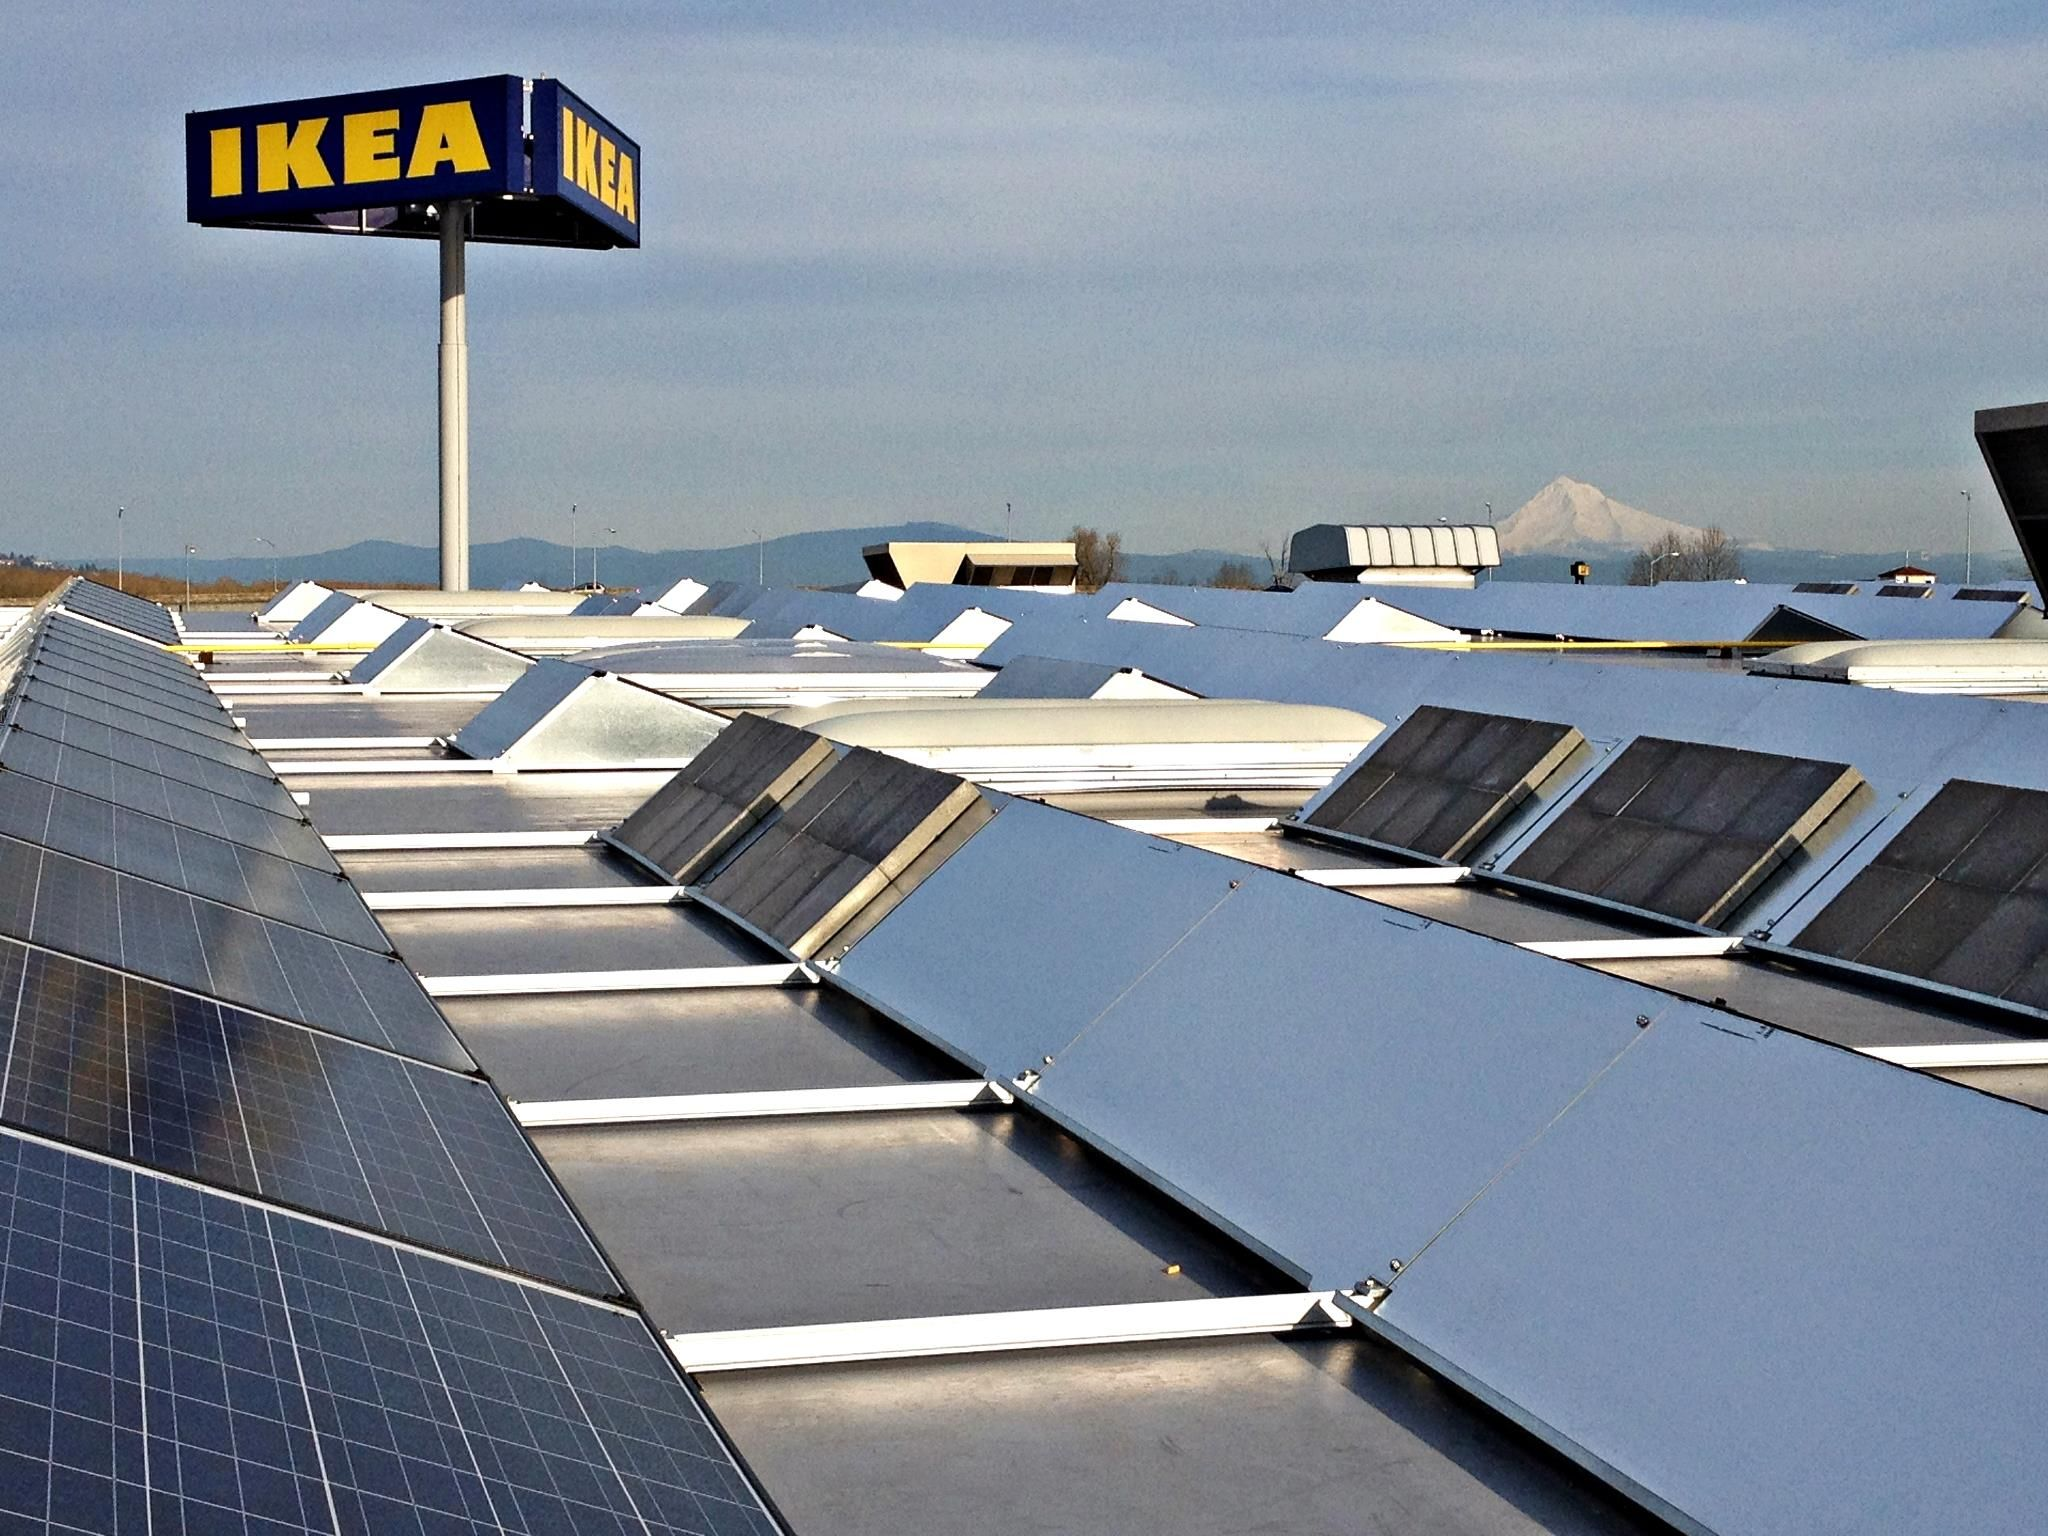 Ikea Turns On Maryland S Largest Rooftop Solar Power System Solar Solar Companies Diy Solar Panel